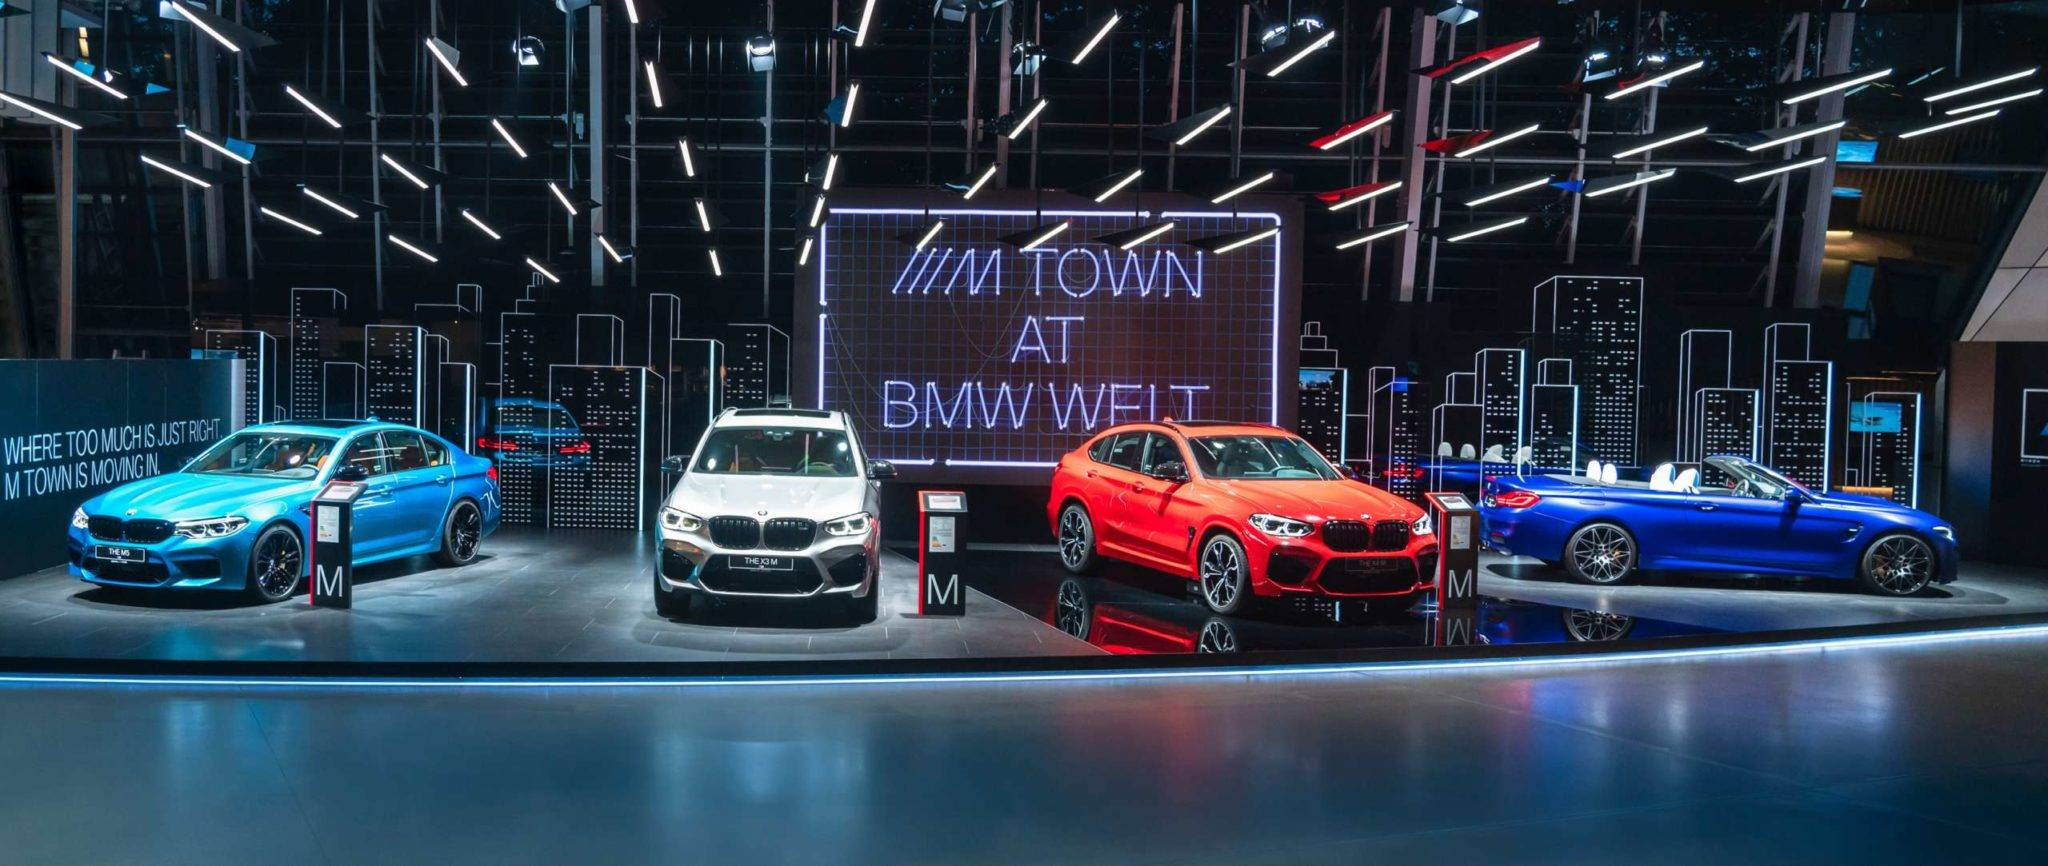 BMW закрыл музеи из-за коронавируса 1